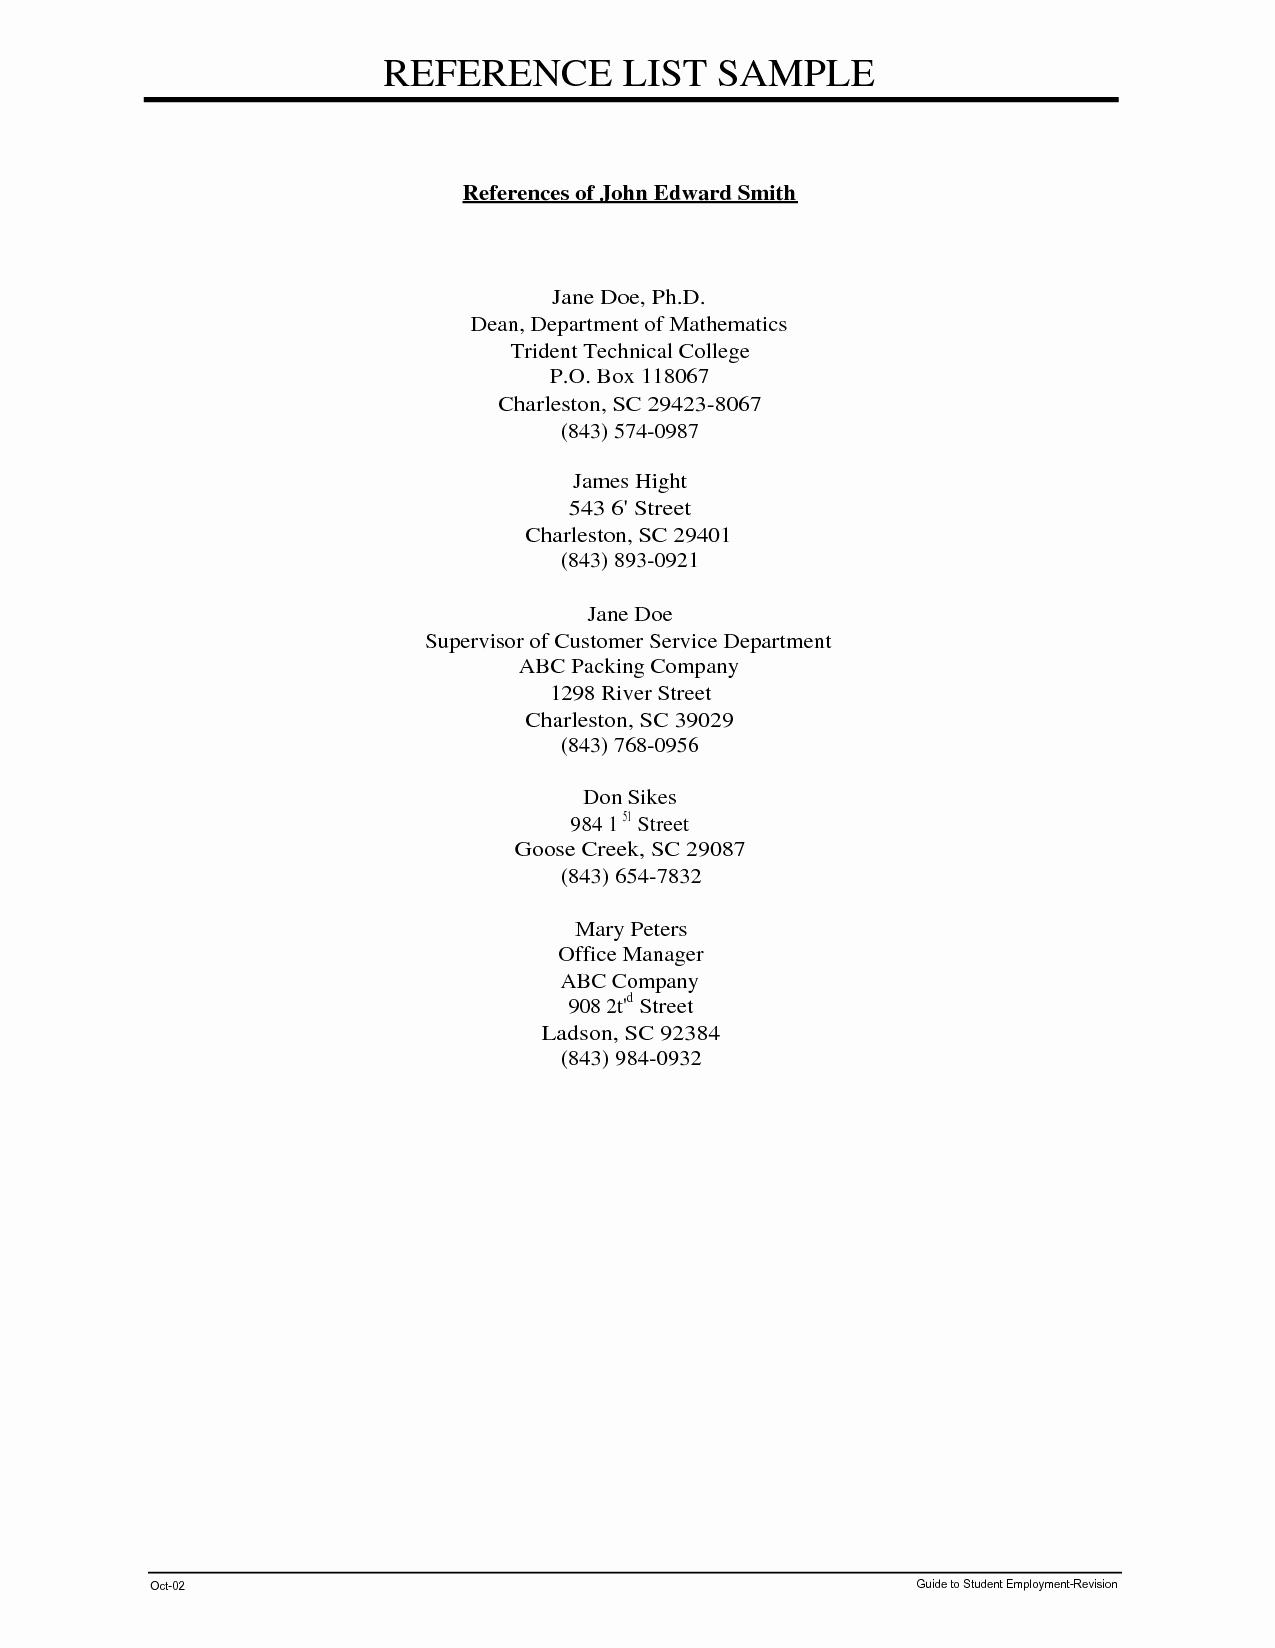 Sample Of List Of References Fresh Sample Professional Reference List Portablegasgrillweber